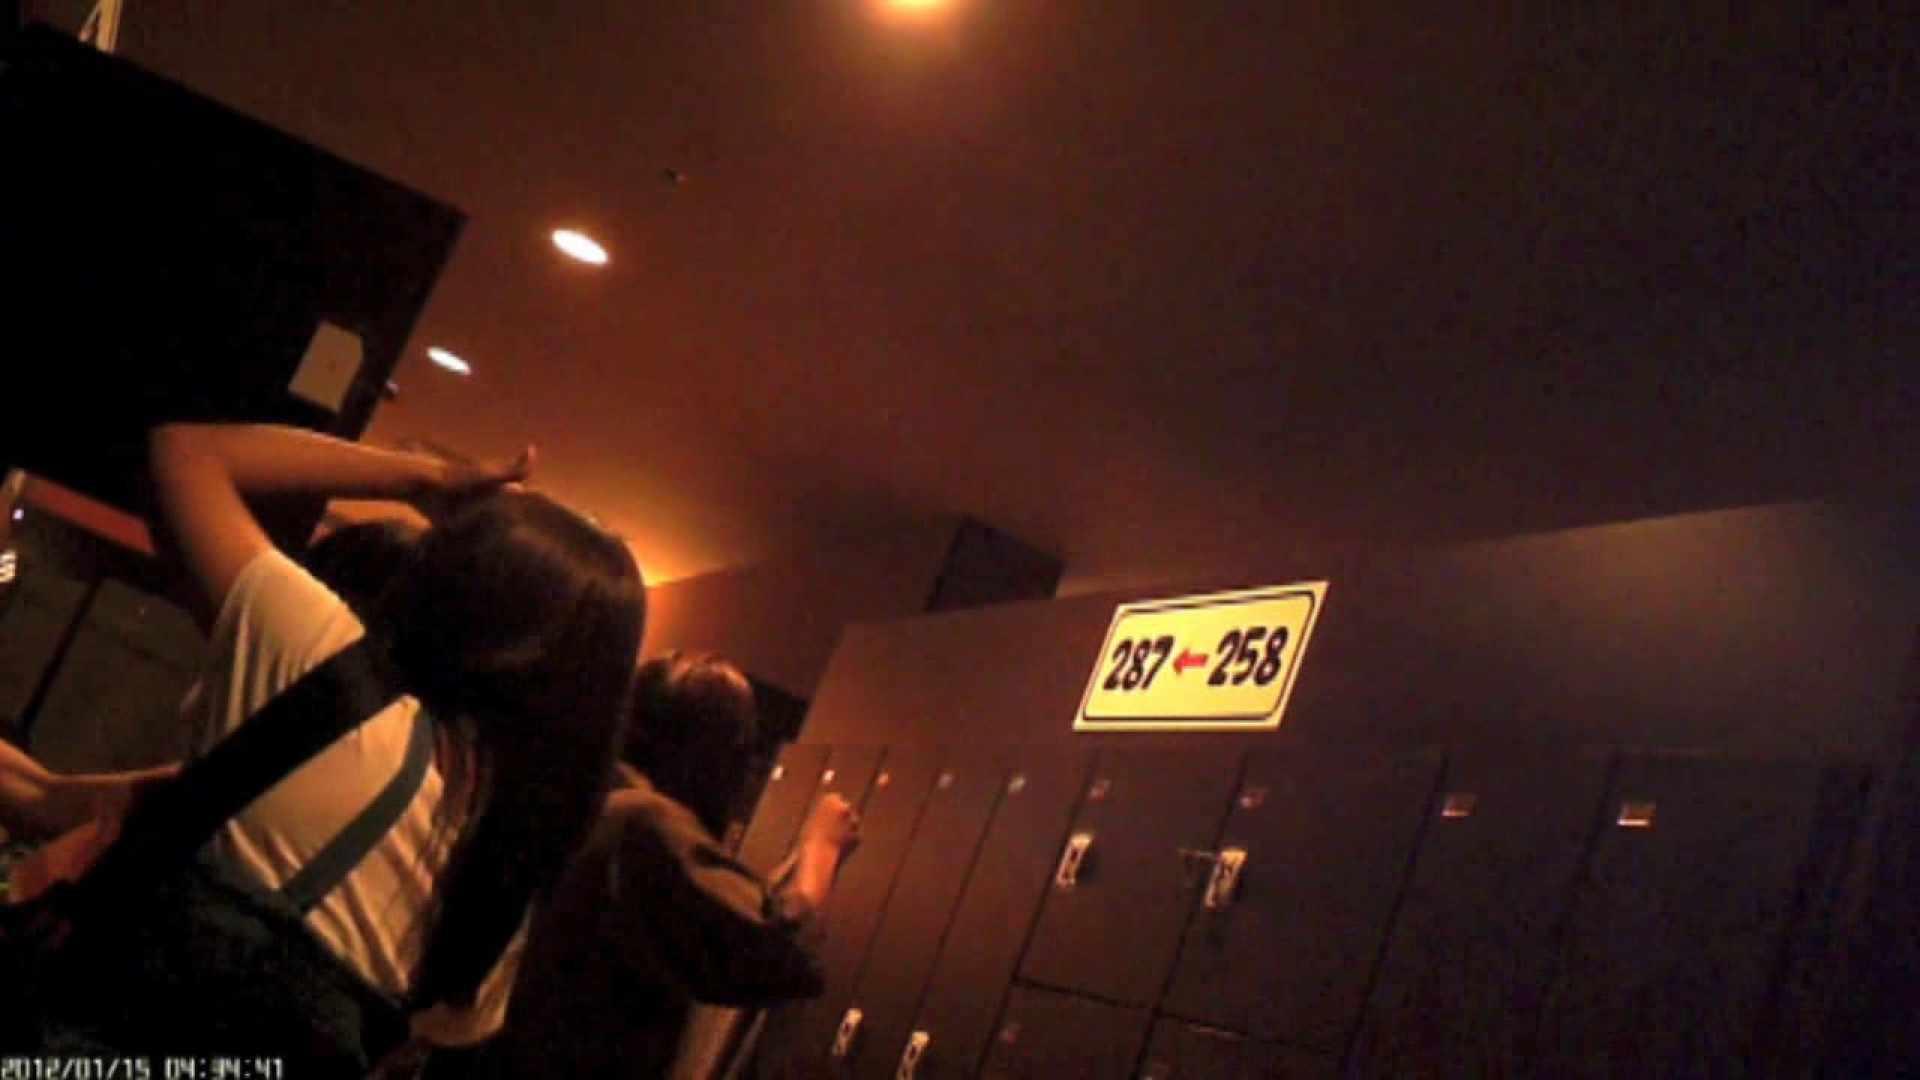 現役ギャル盗撮師 hana様の女風呂潜入撮!Vol.5 女風呂 オメコ無修正動画無料 60画像 48